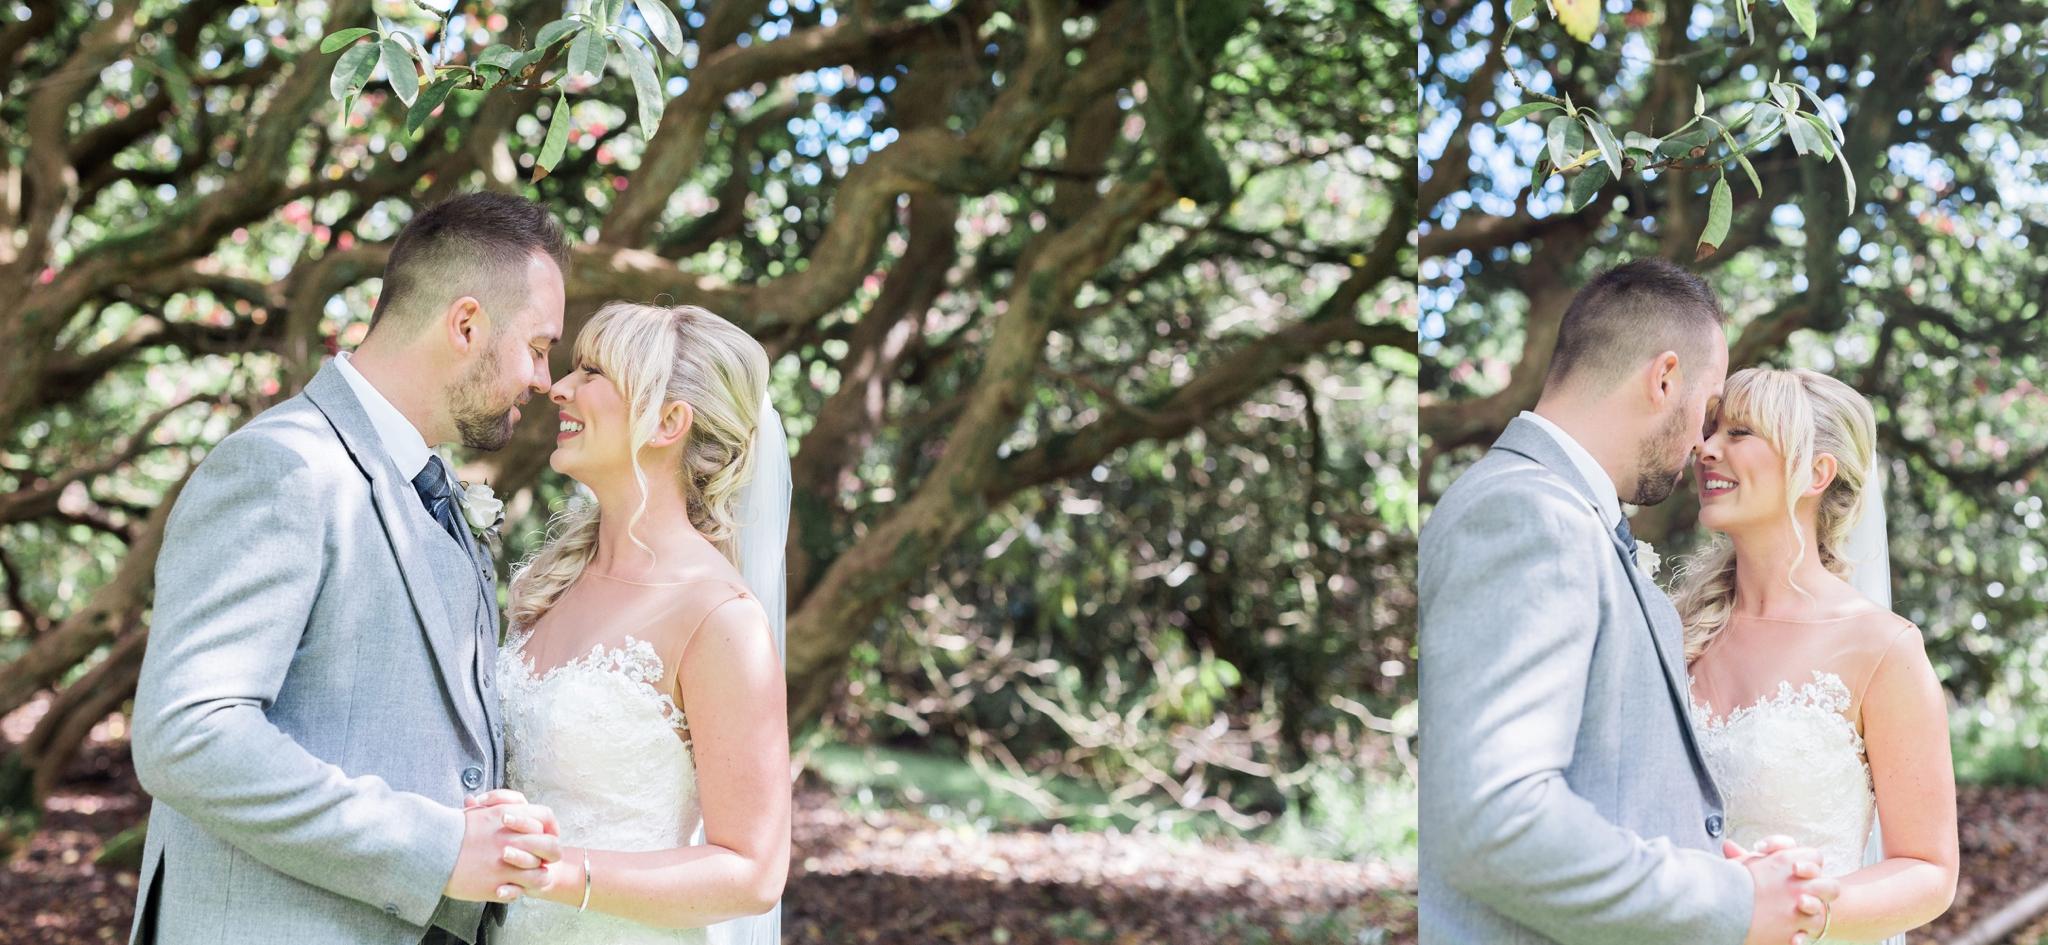 Suzanne_li_photography_Roman_camp_wedding_0016.jpg